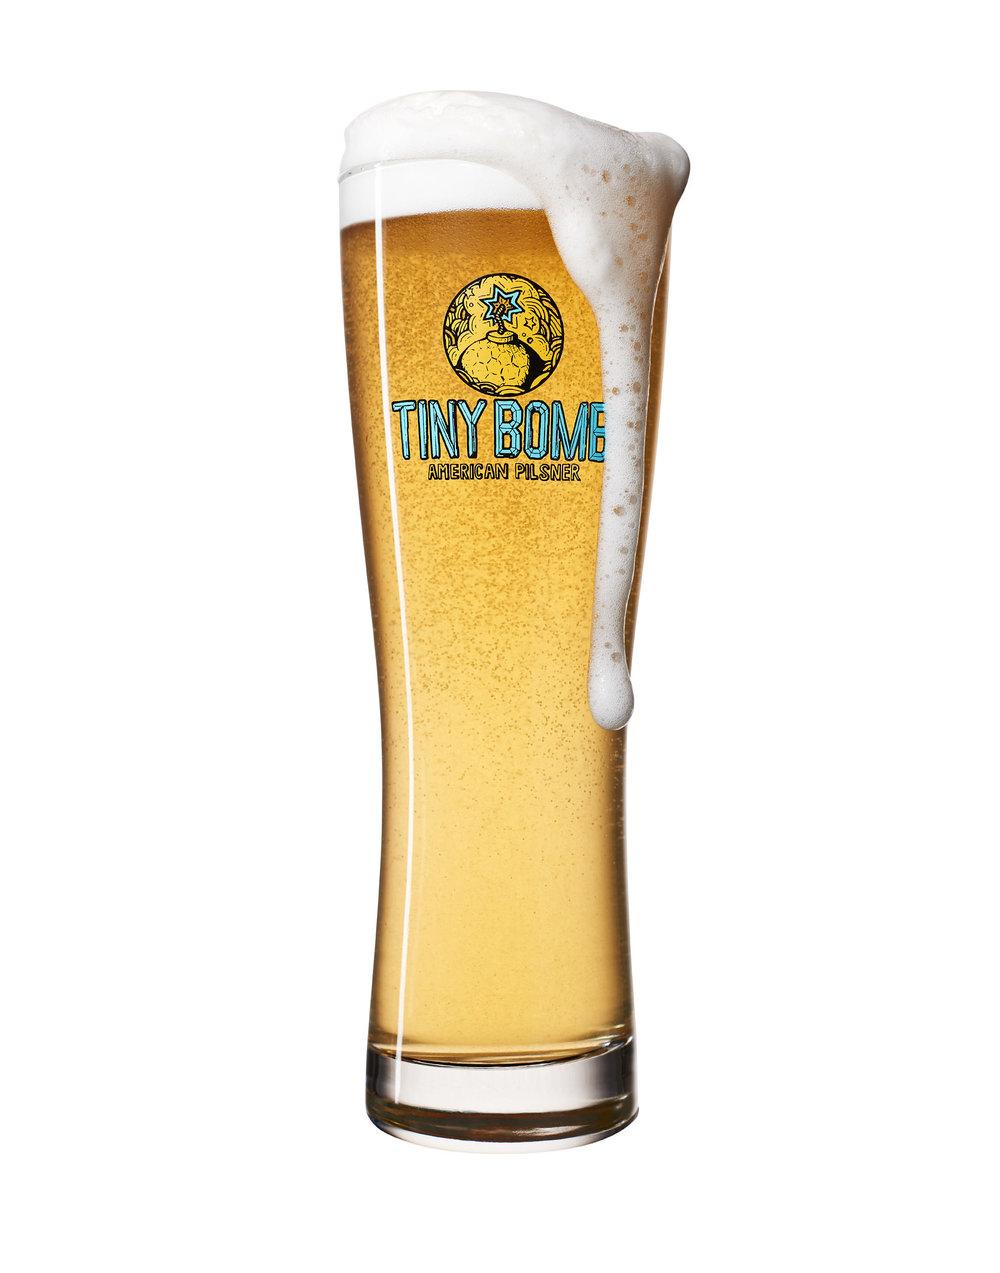 Wiseacre-Beer-TinyBomb-Glass.jpg